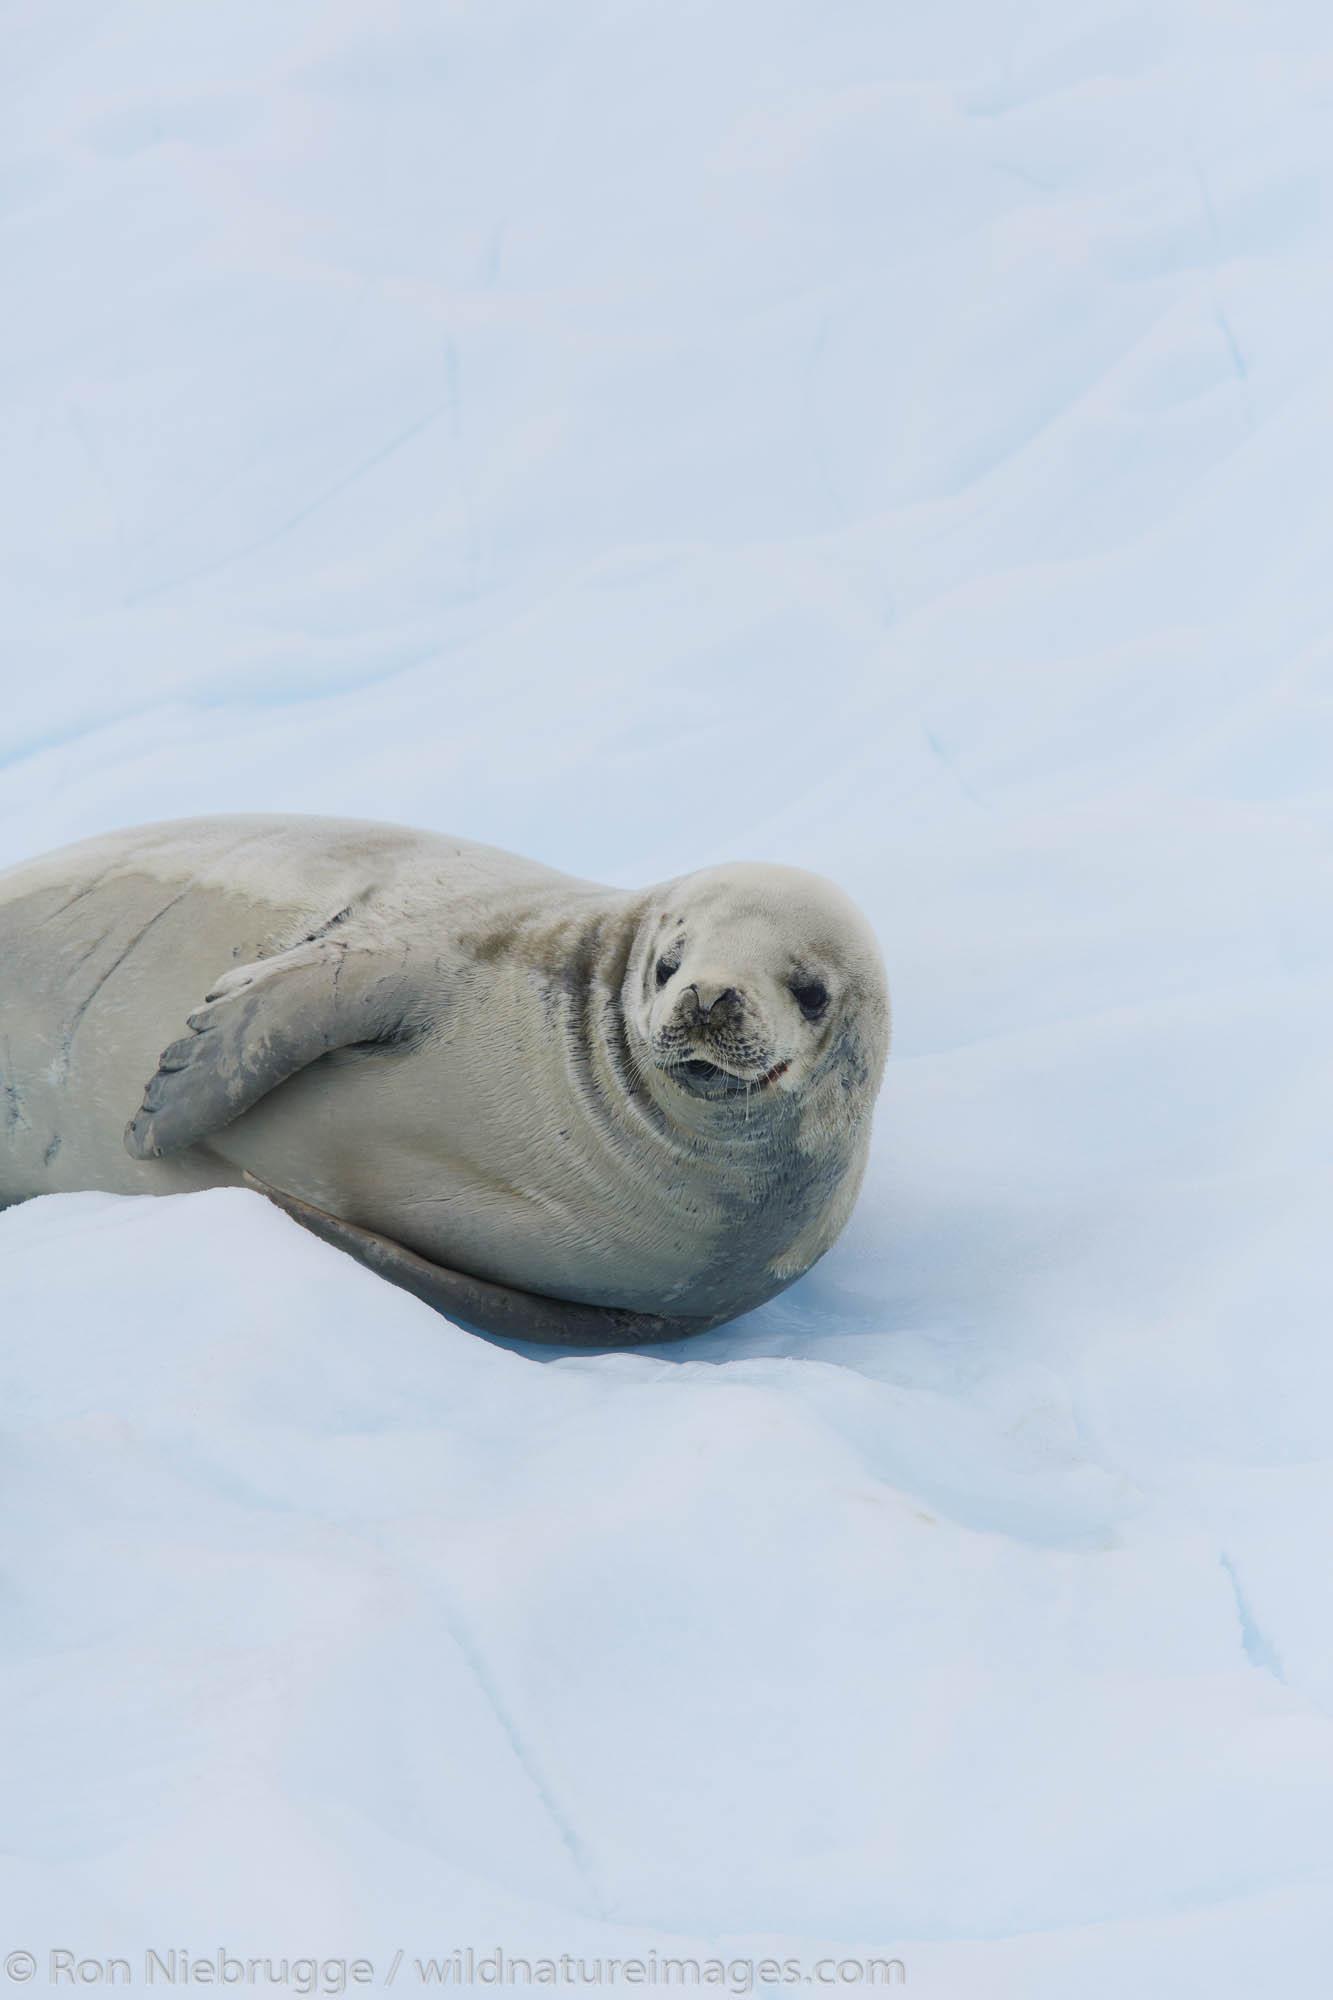 Crabeater seal, (Lobodon carcinophagus) on icebergs in Paradise Bay, Antarctica.